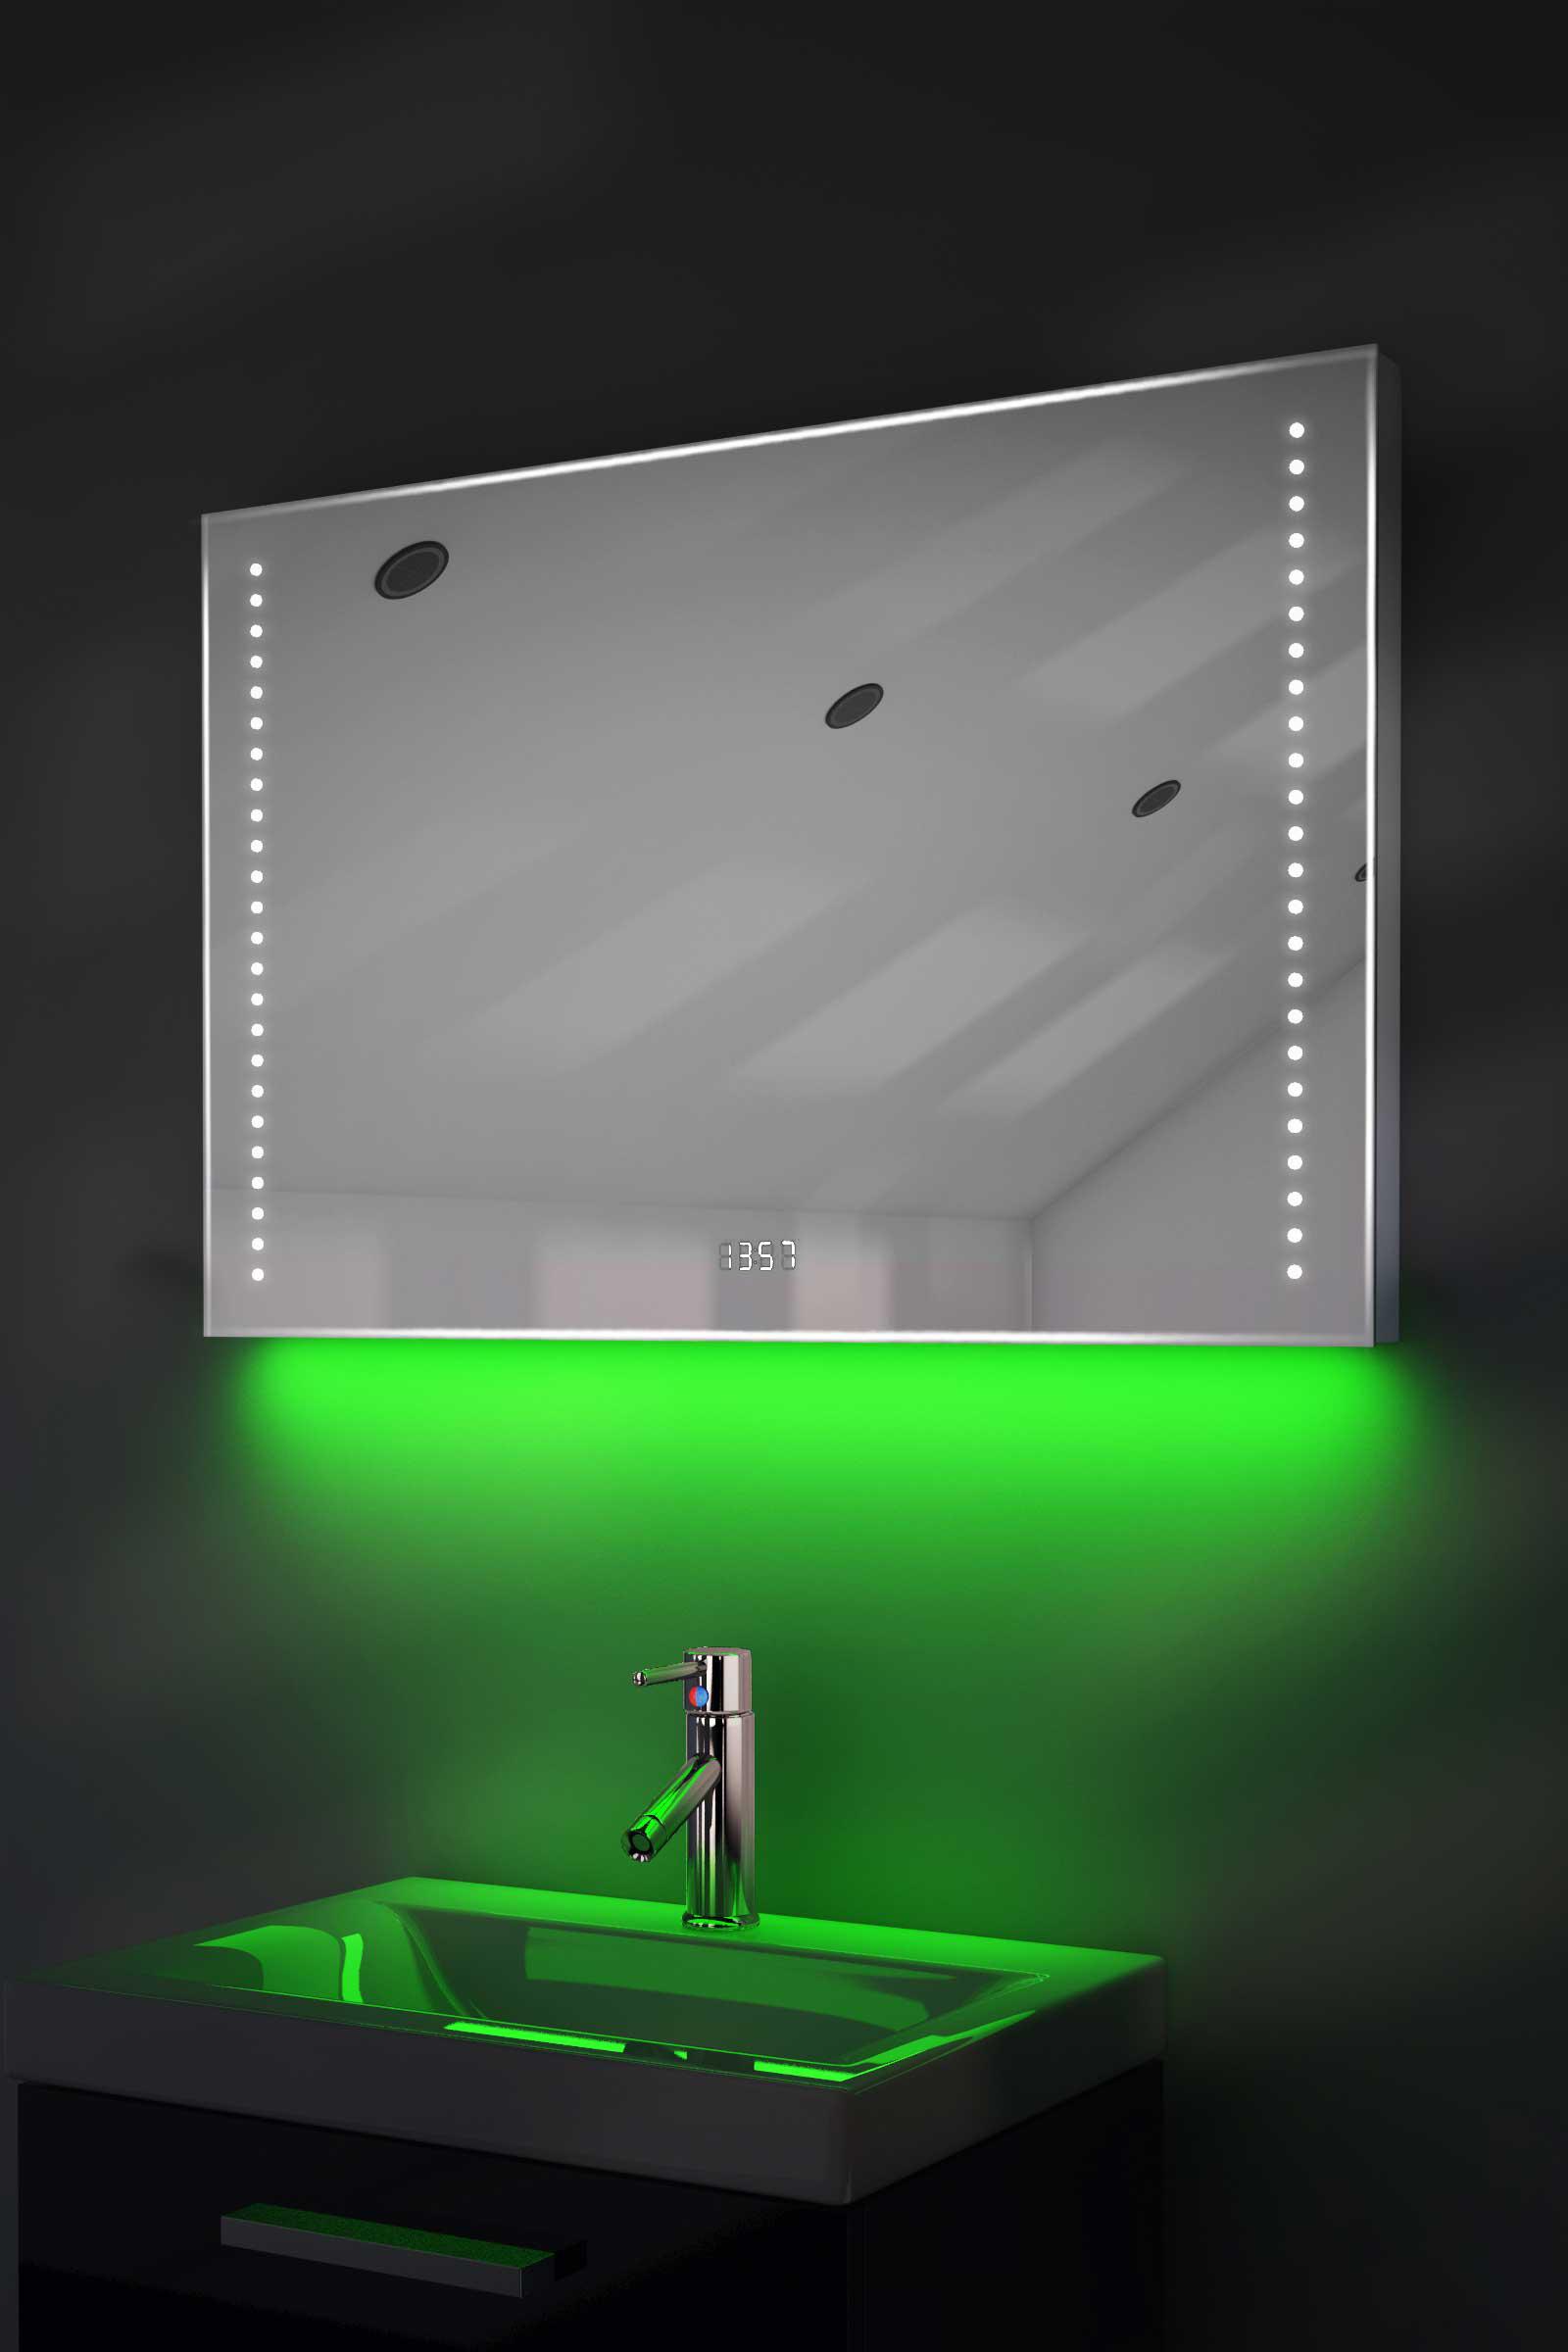 Digital Clock Shaver Bathroom Mirror With Under Lighting Demist Sensor K195g Ebay